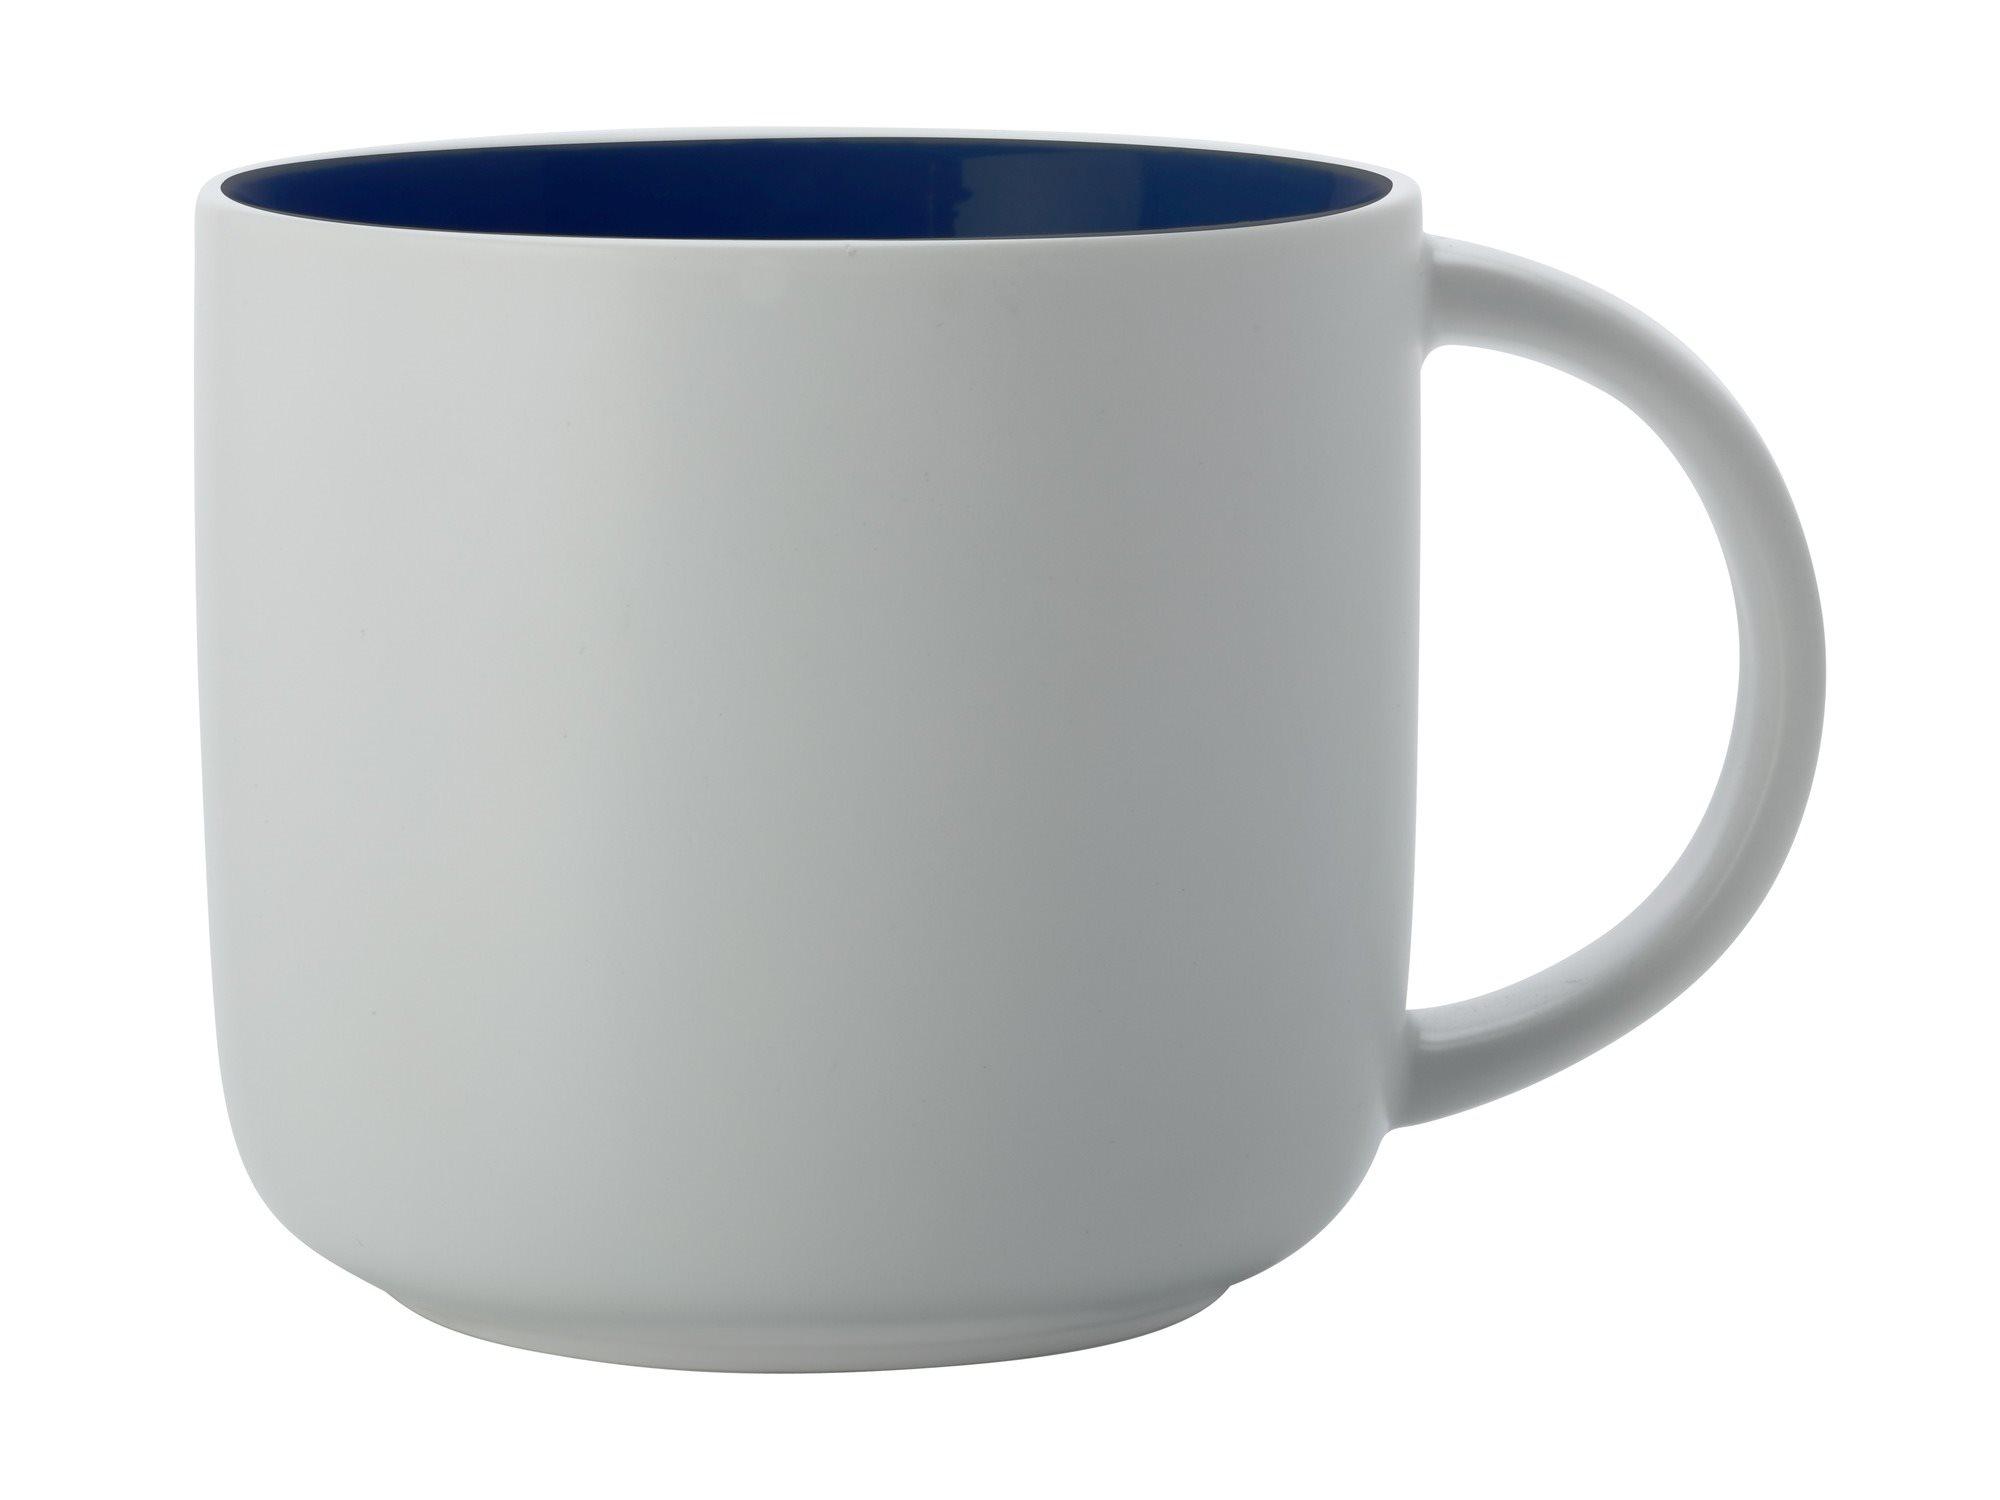 Maxwell & Williams Κούπα Μπλε Σκούρο Tint 440ml